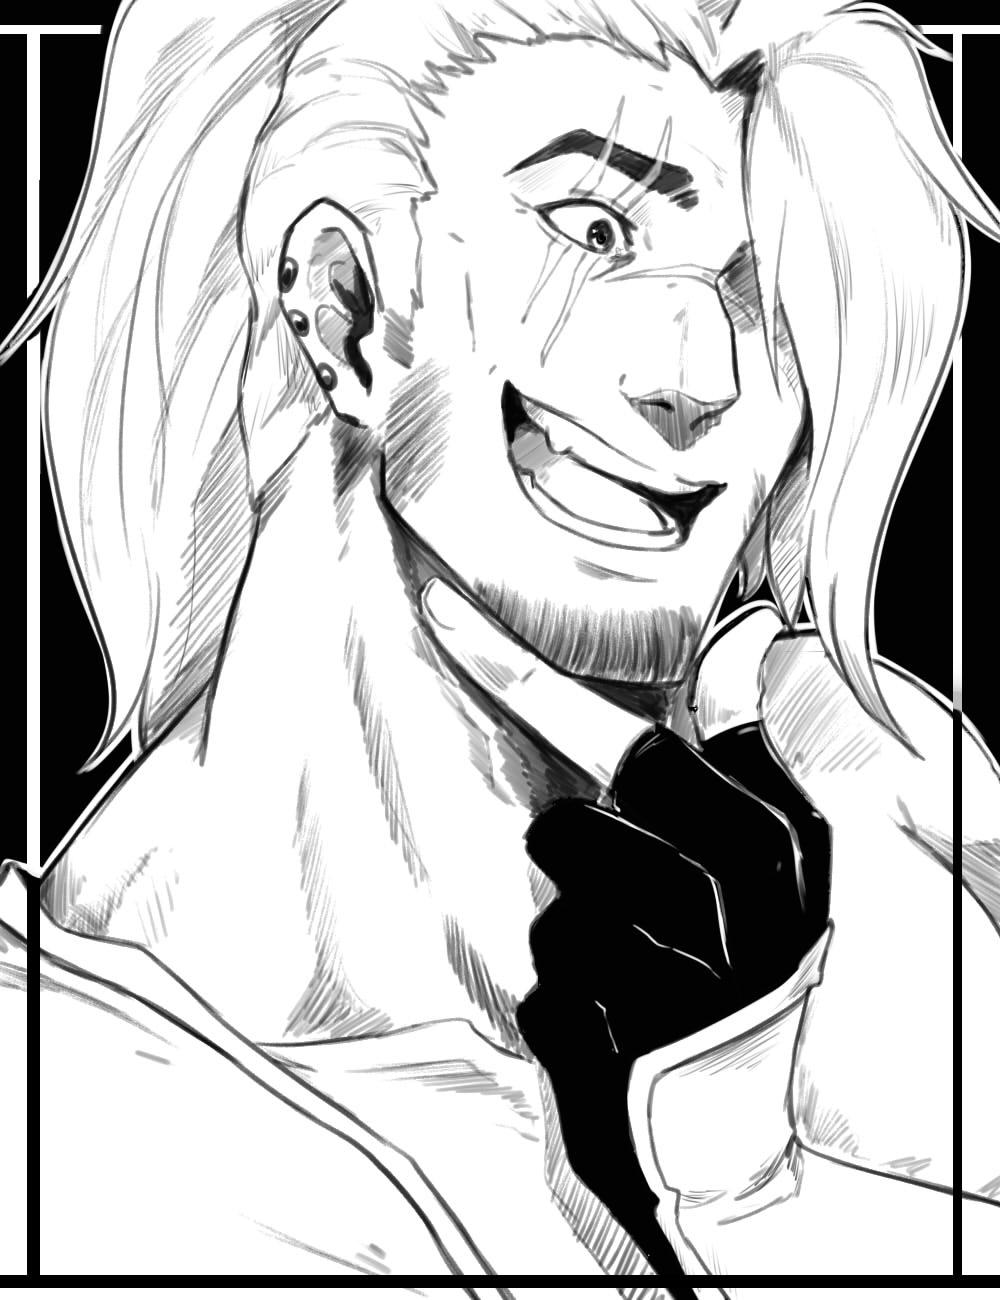 OC -tober #5 - Comic relief character by Antarija